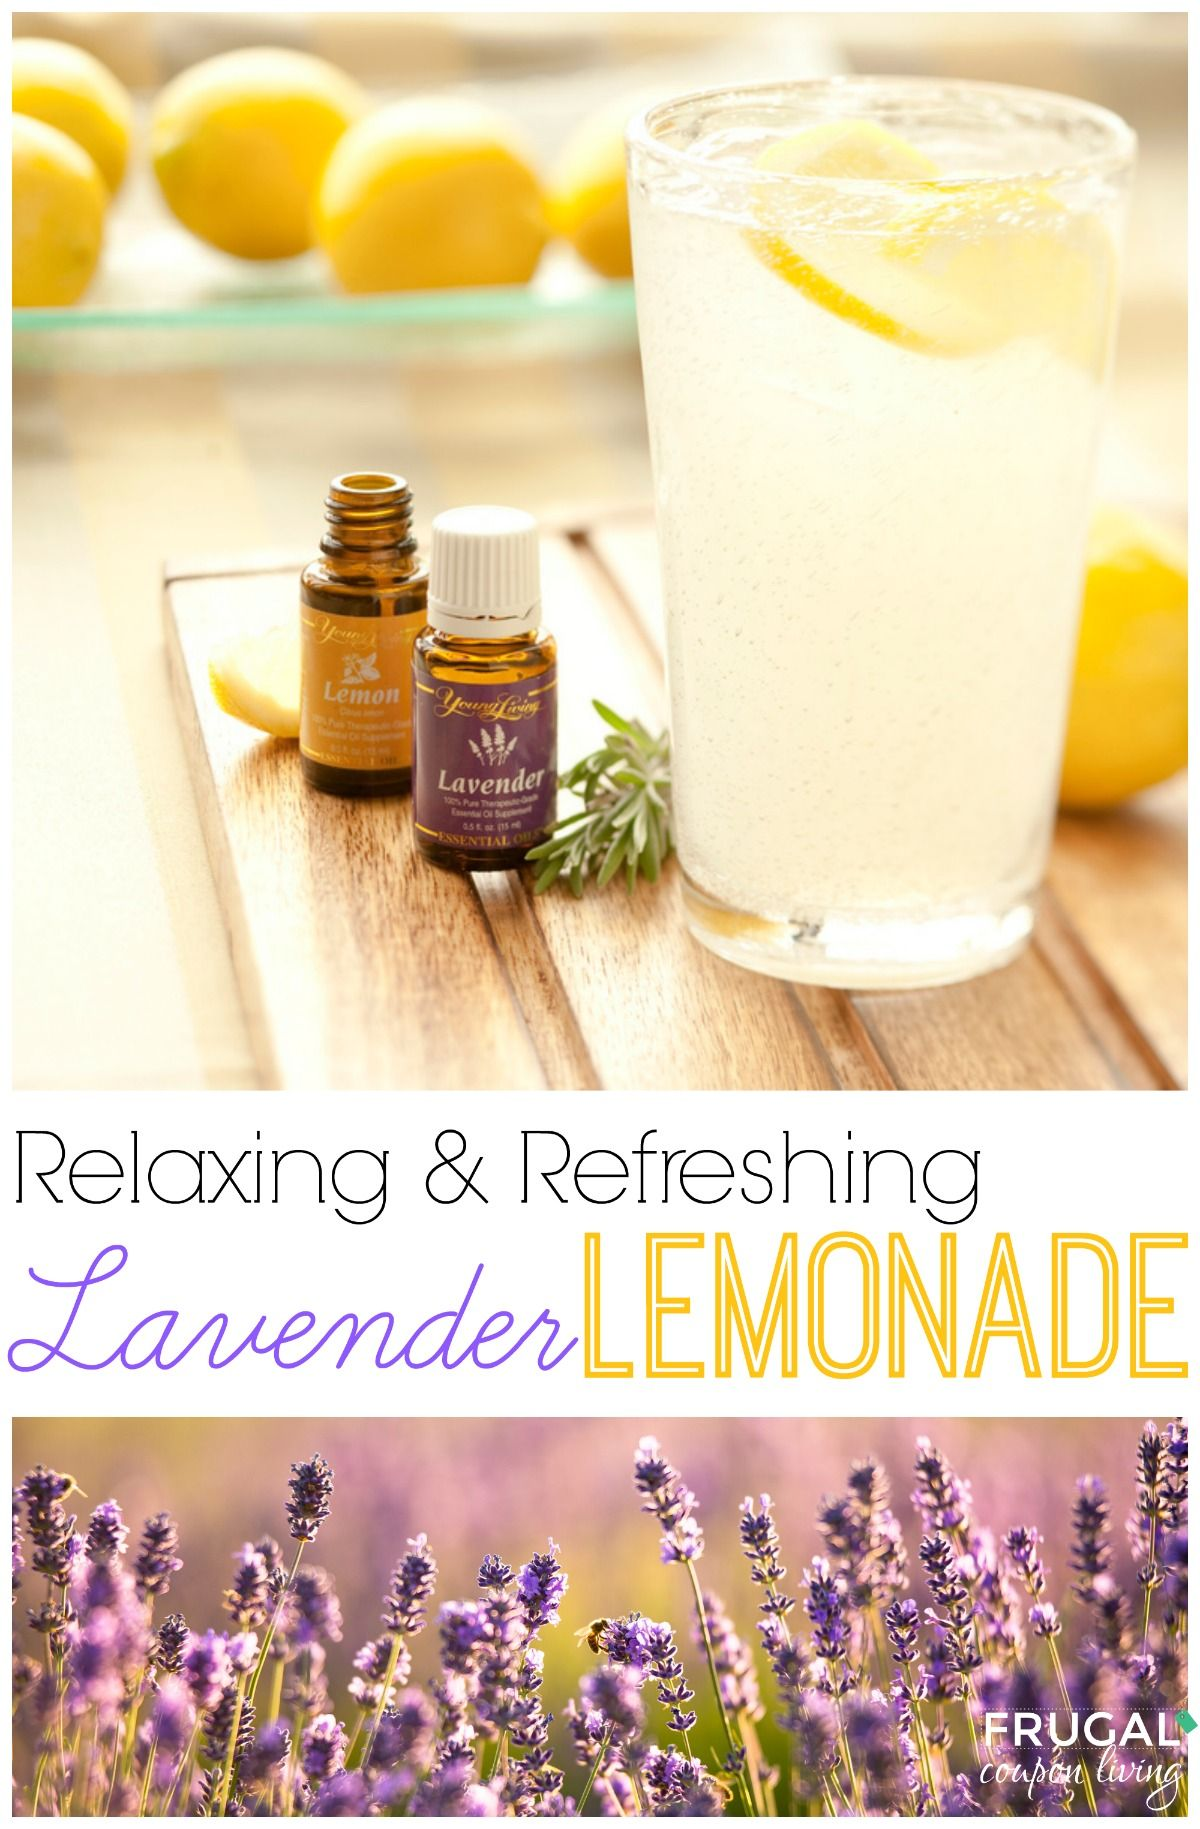 Relaxing and Refreshing Lavender Lemonade Recipe